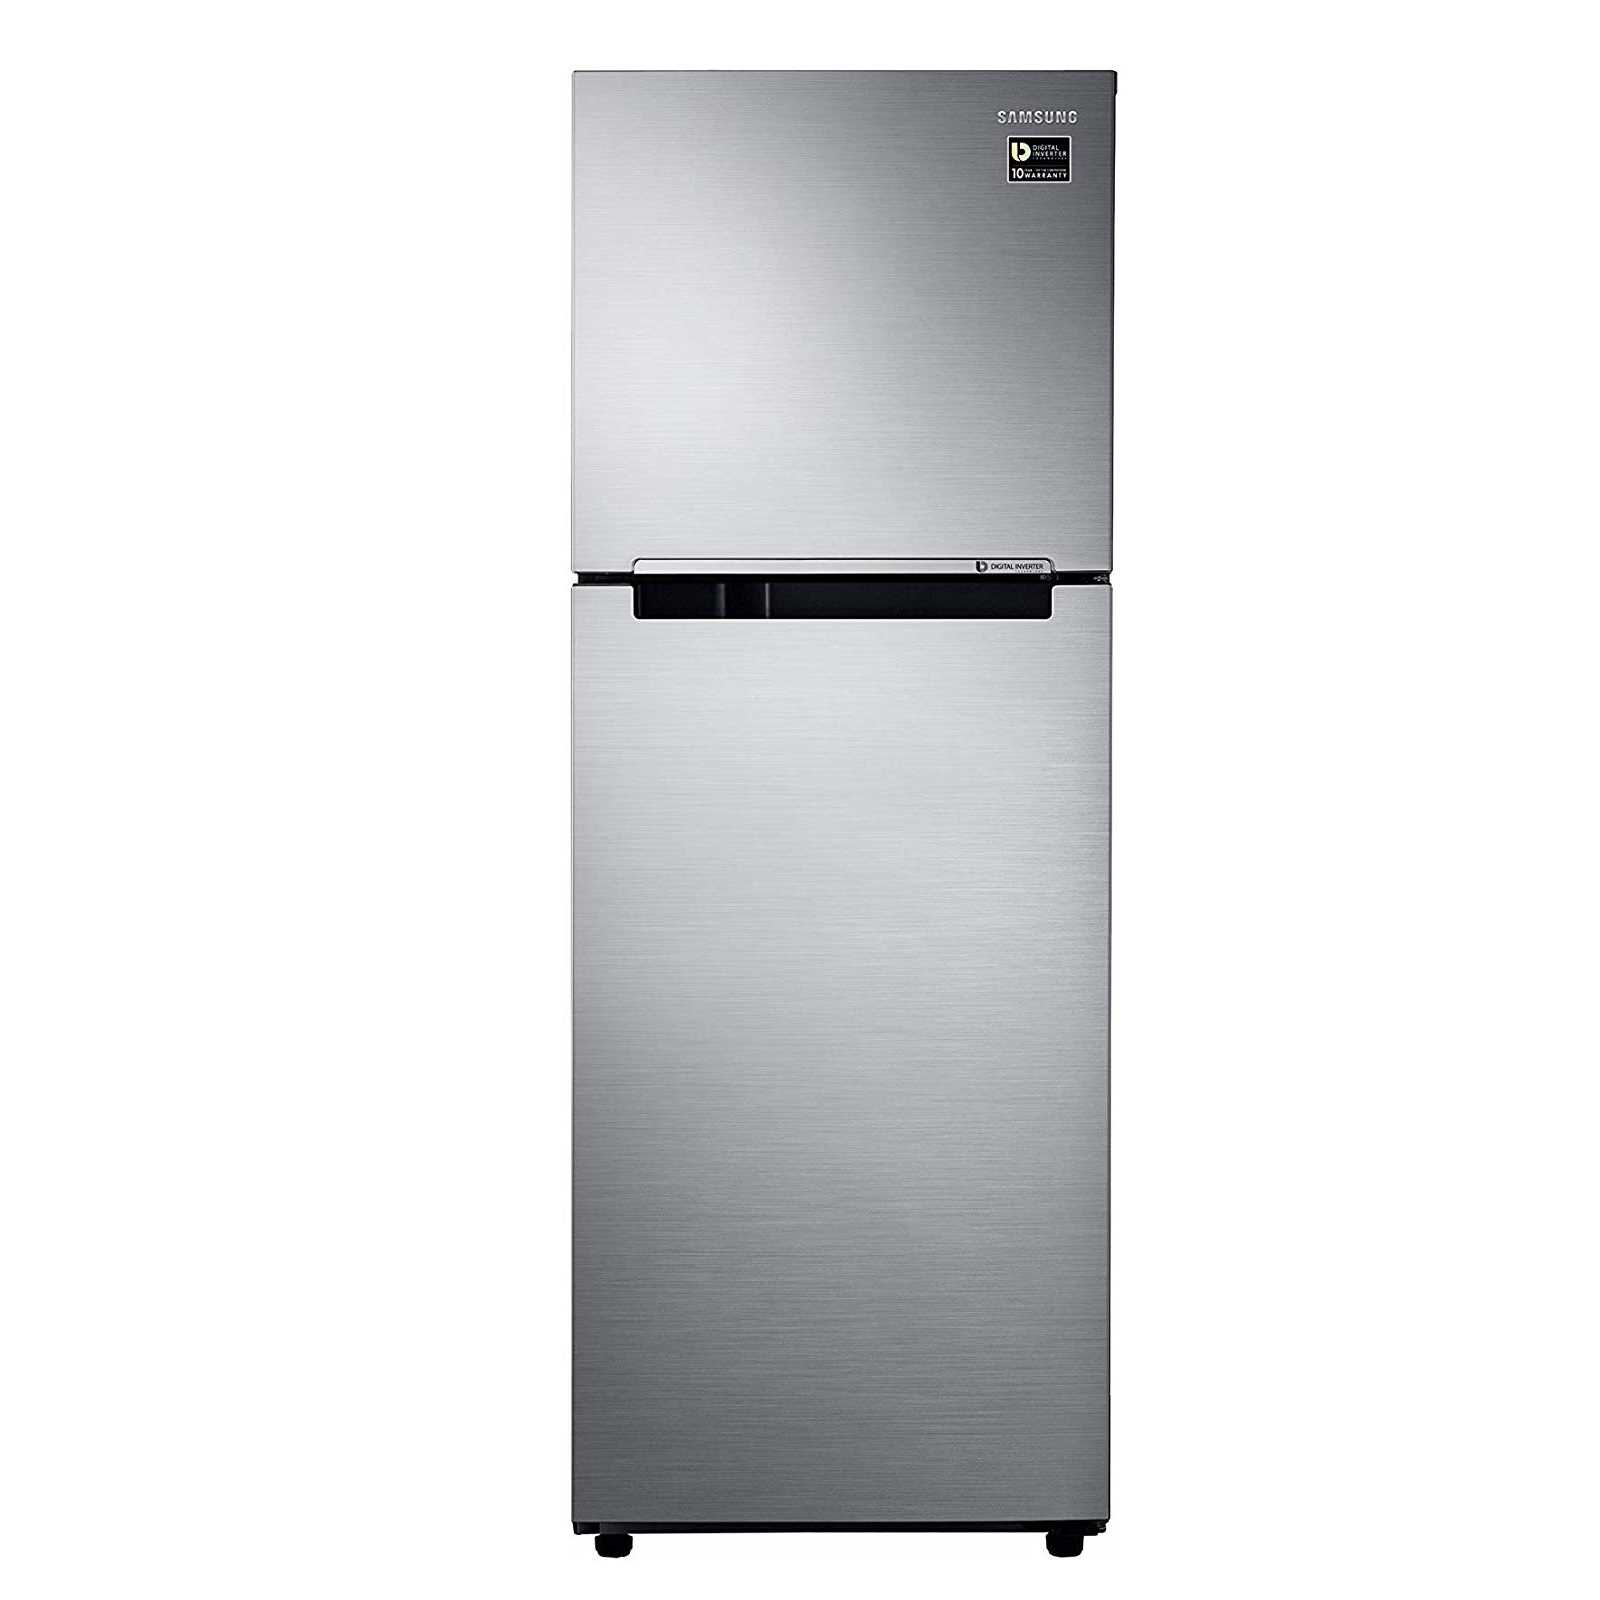 Samsung RT28N3083S9 HL 253 Litres Frost Free Double Door Refrigerator